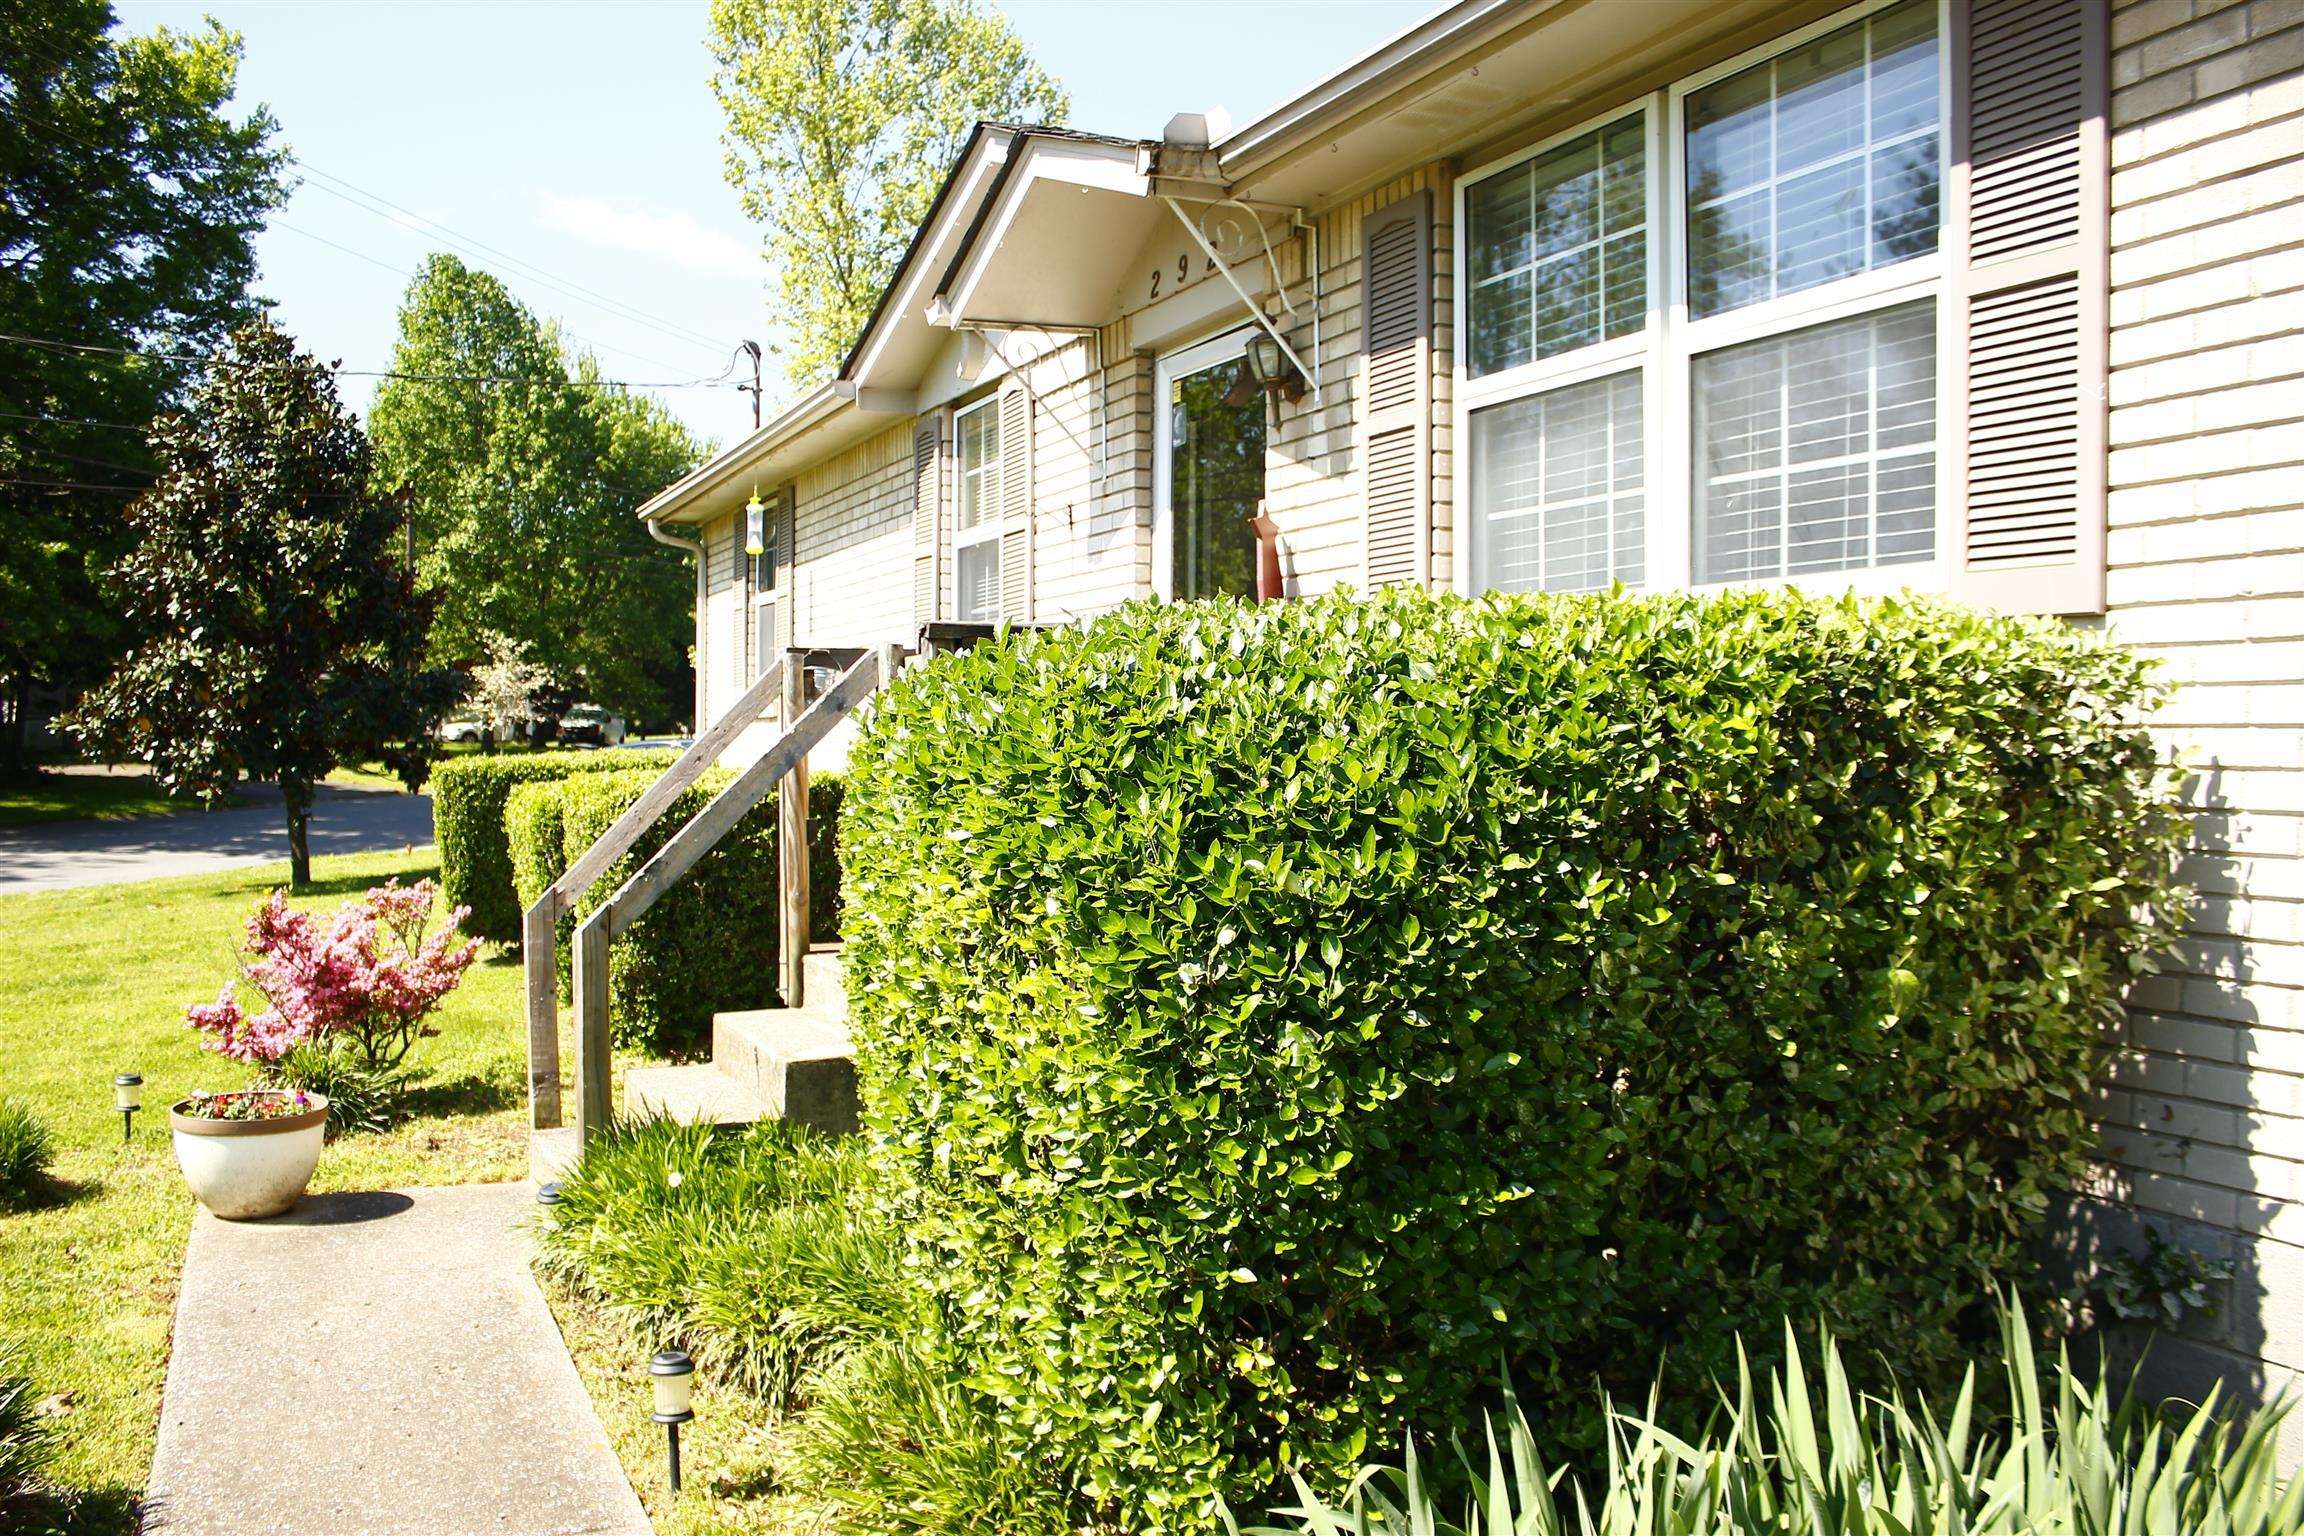 292 Bart Dr, Antioch, TN 37013 - Antioch, TN real estate listing